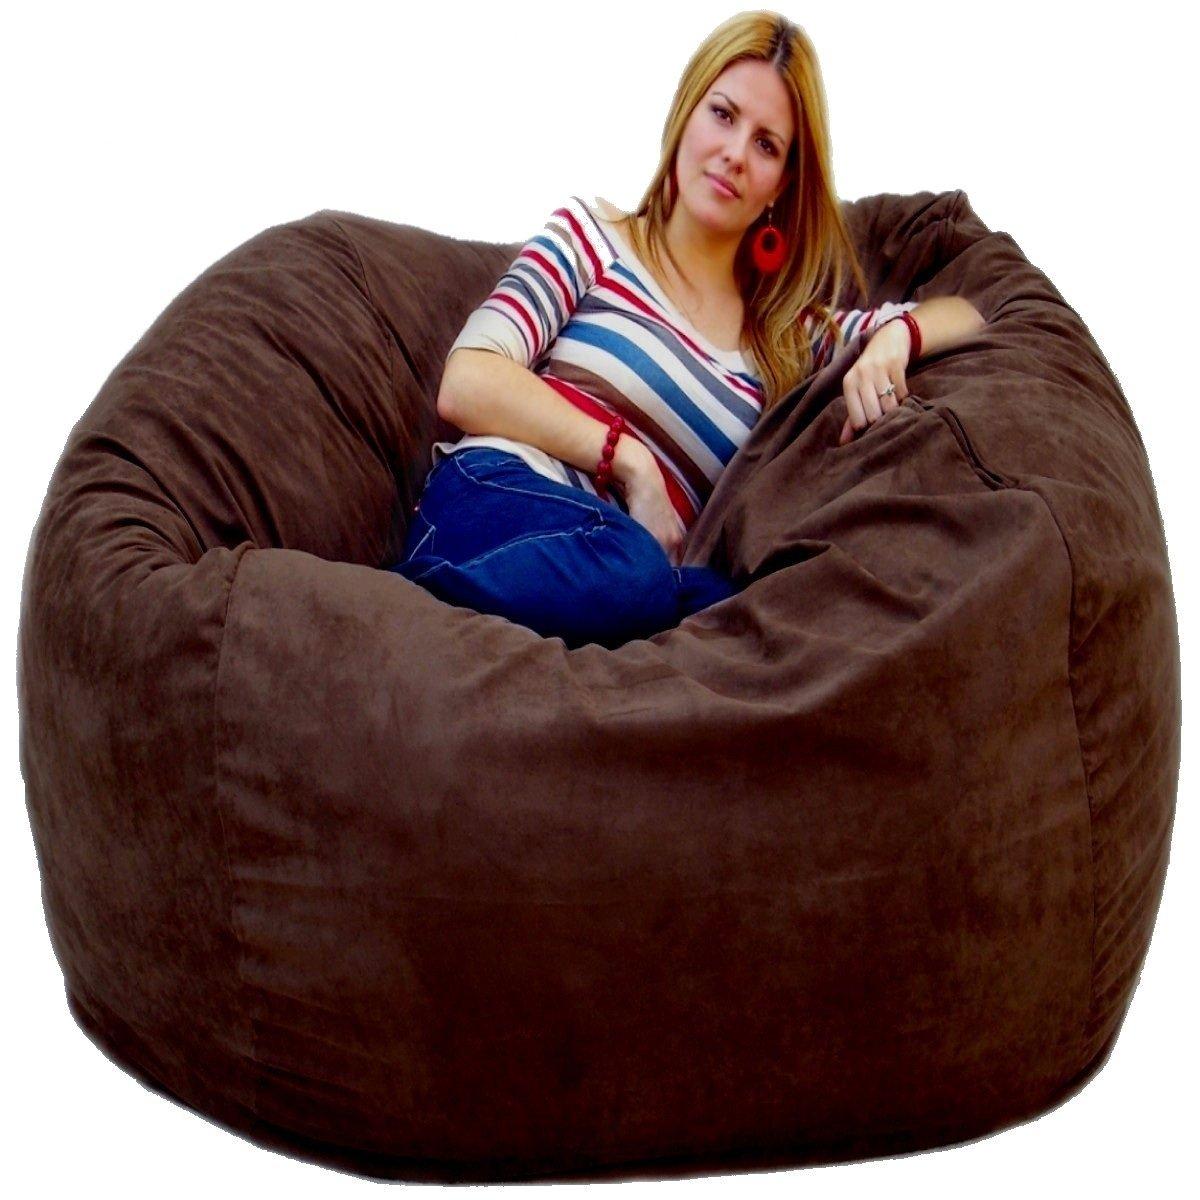 Cozy Sack 5-Feet Bean Bag Chair, Large, Chocolate by Cozy Sack